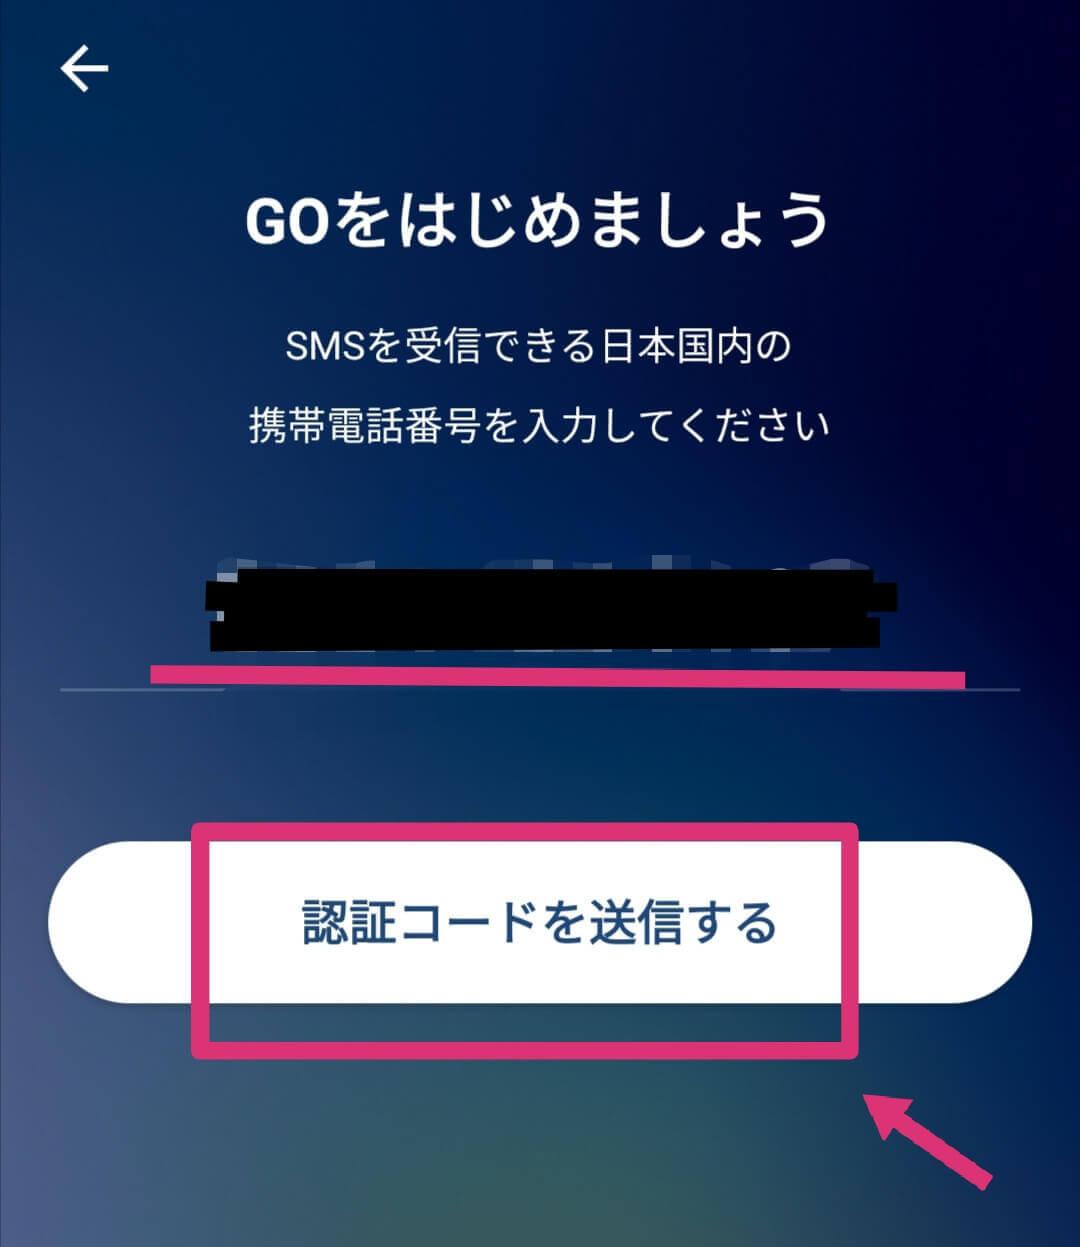 GOタクシーアプリのクーポンコード使い方・適用方法4